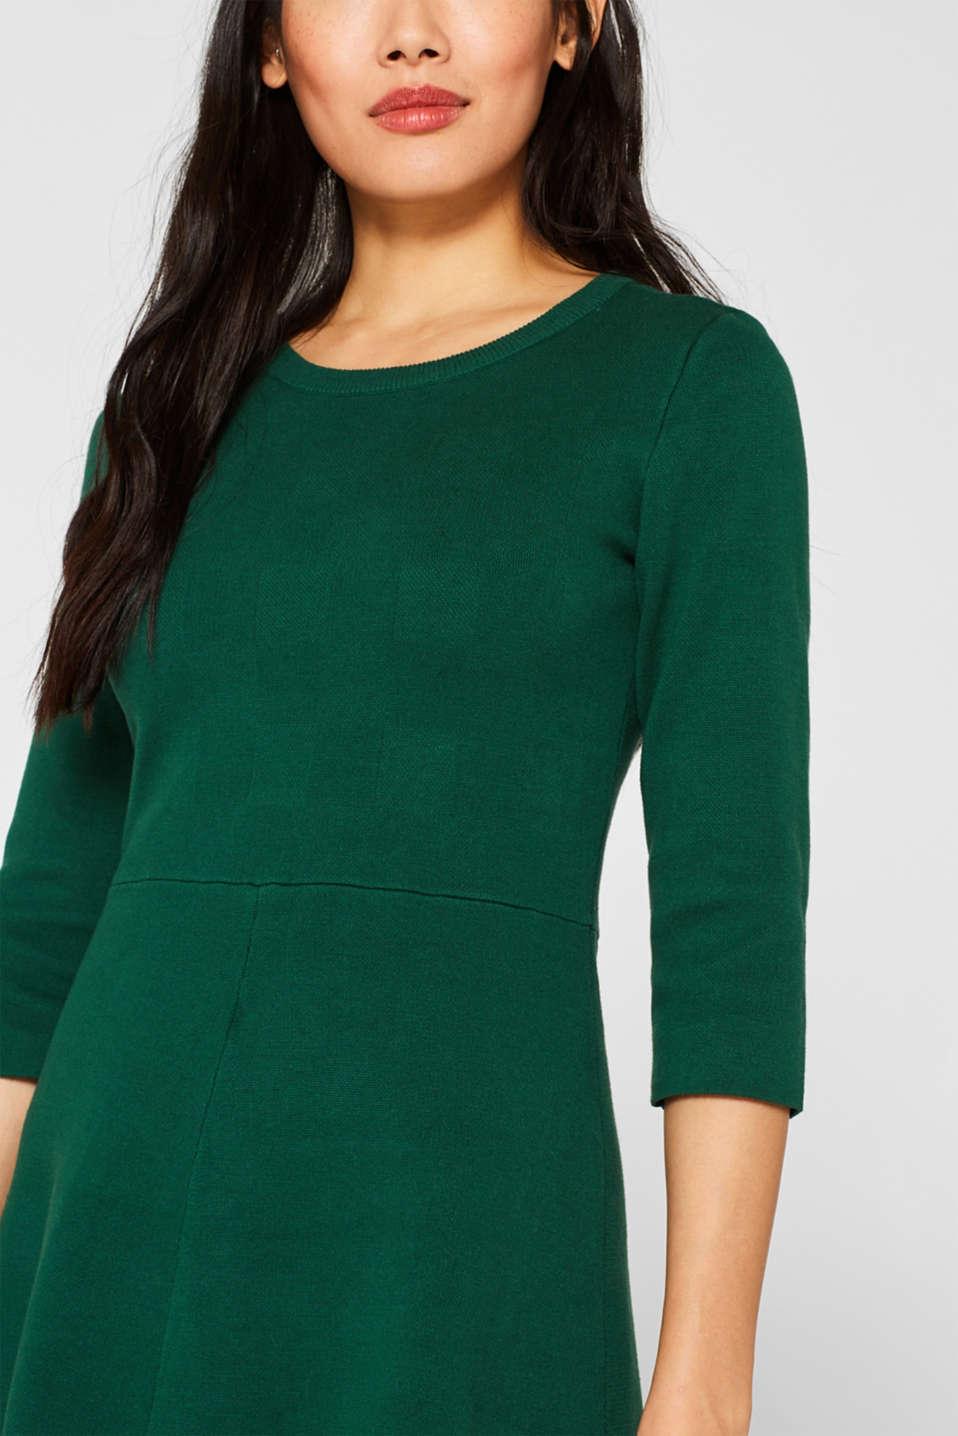 Dresses flat knitted, BOTTLE GREEN, detail image number 3